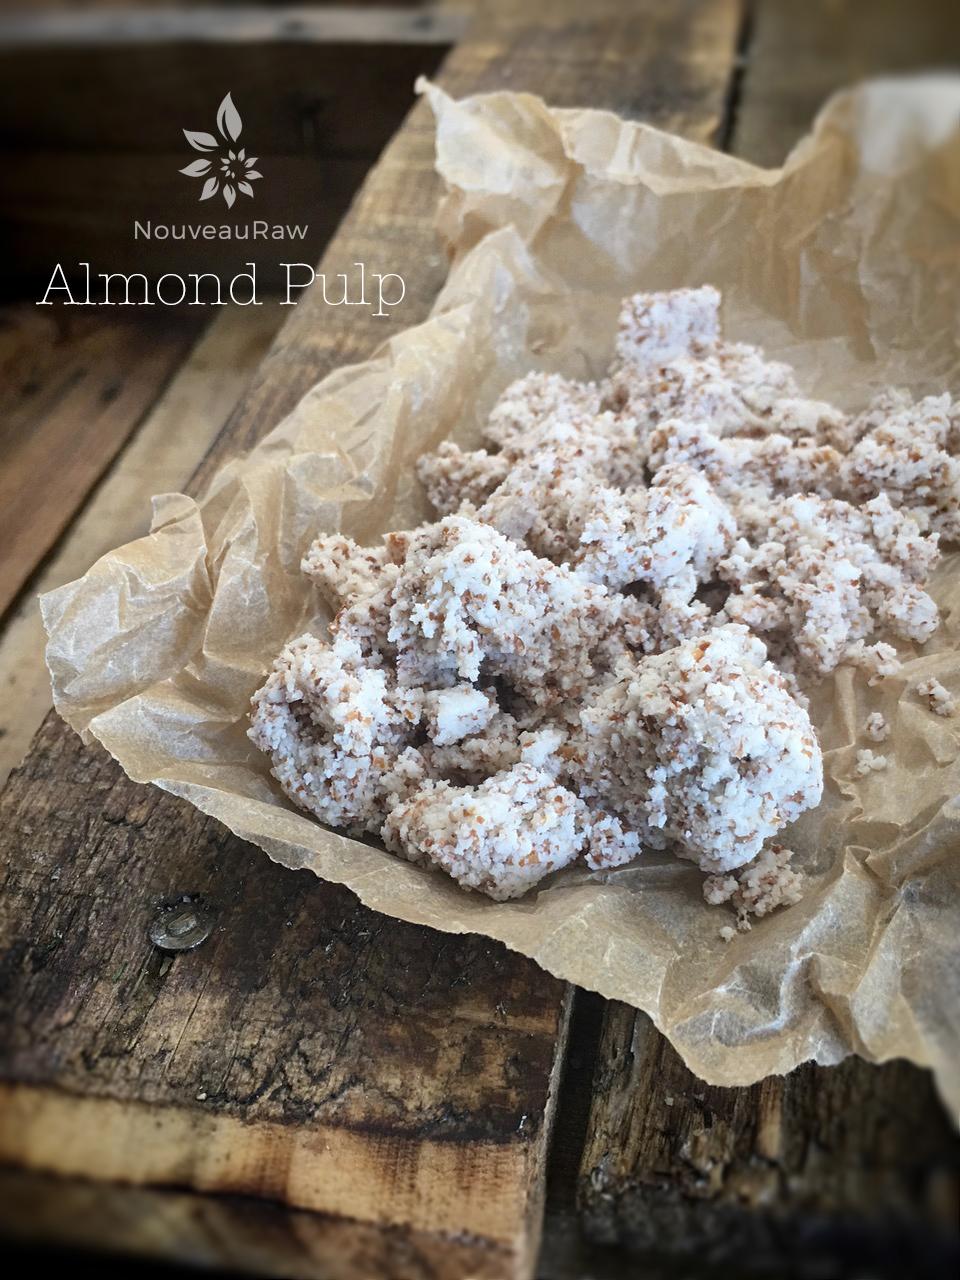 wet almond pulp on a piece of parchment paper